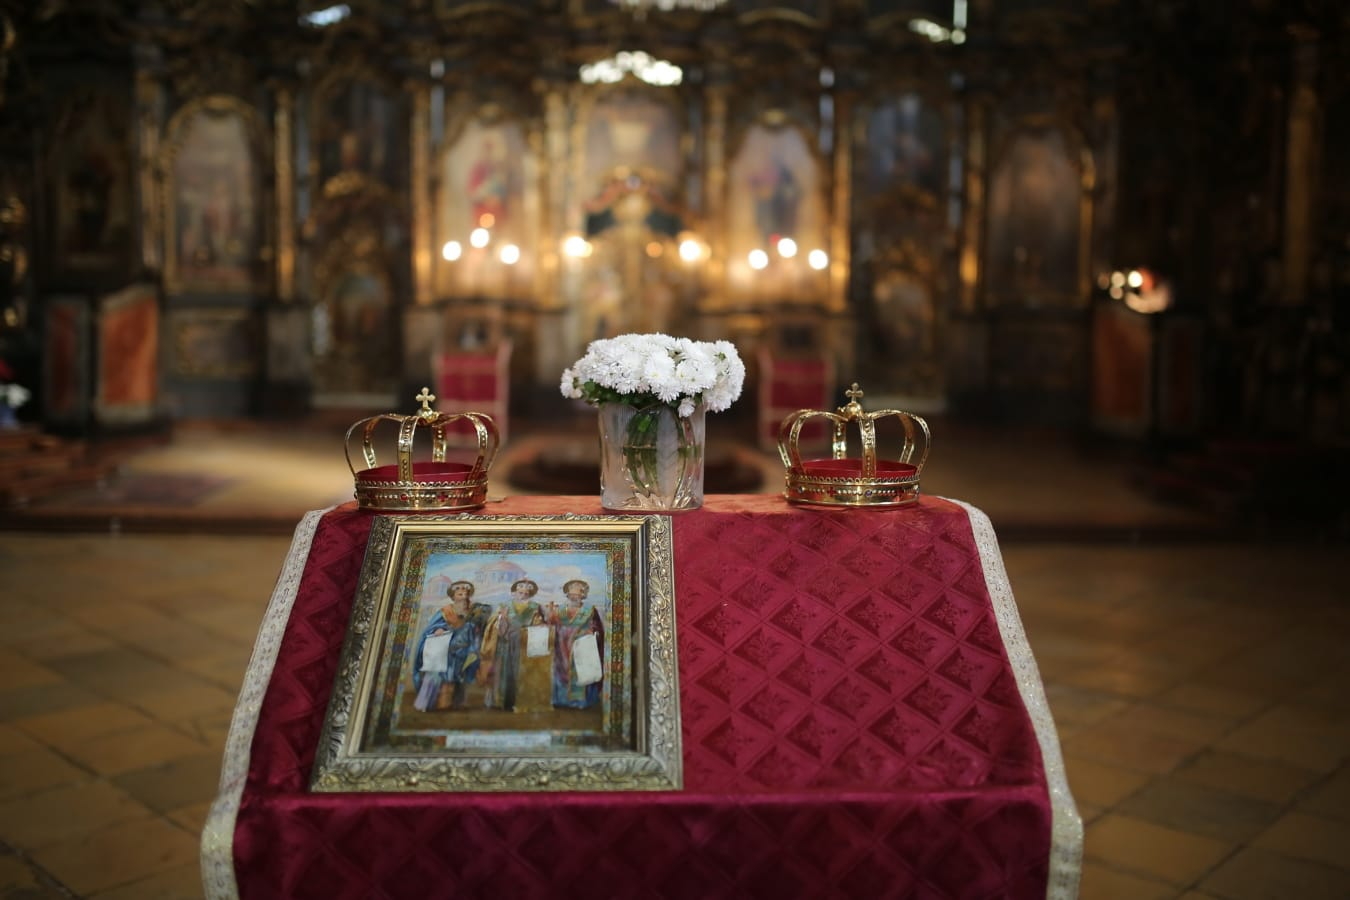 Serbien, orthodoxe, Kirche, Altar, Symbol, Heilige, Krönung, Krone, Kerze, Struktur